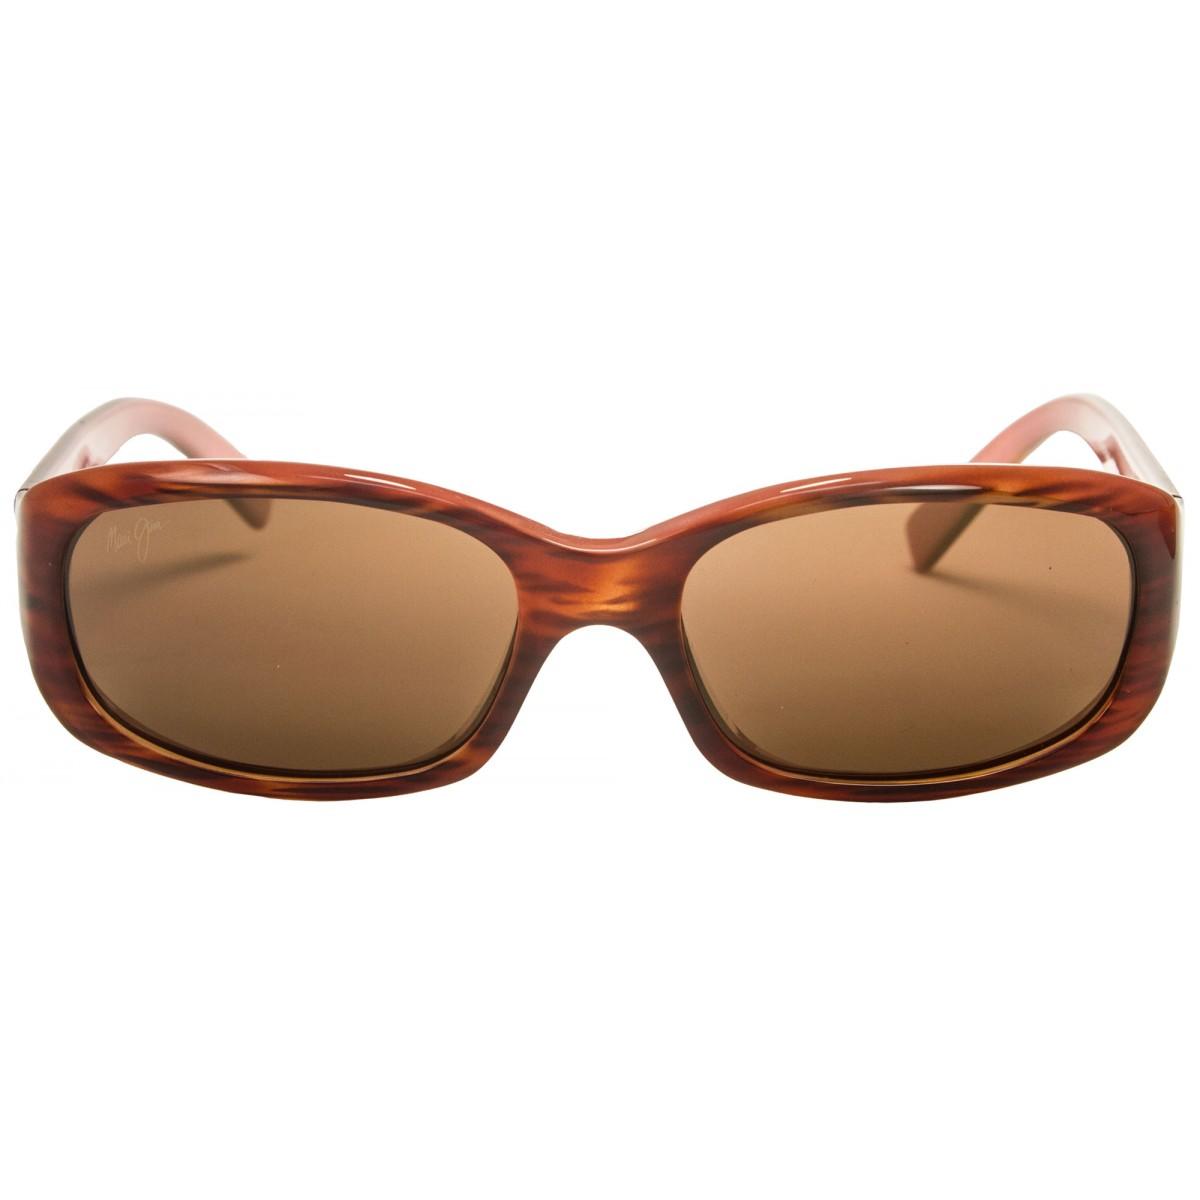 856ea4de57 Online Eyeglasses with Customer Service Center in California Maui ...